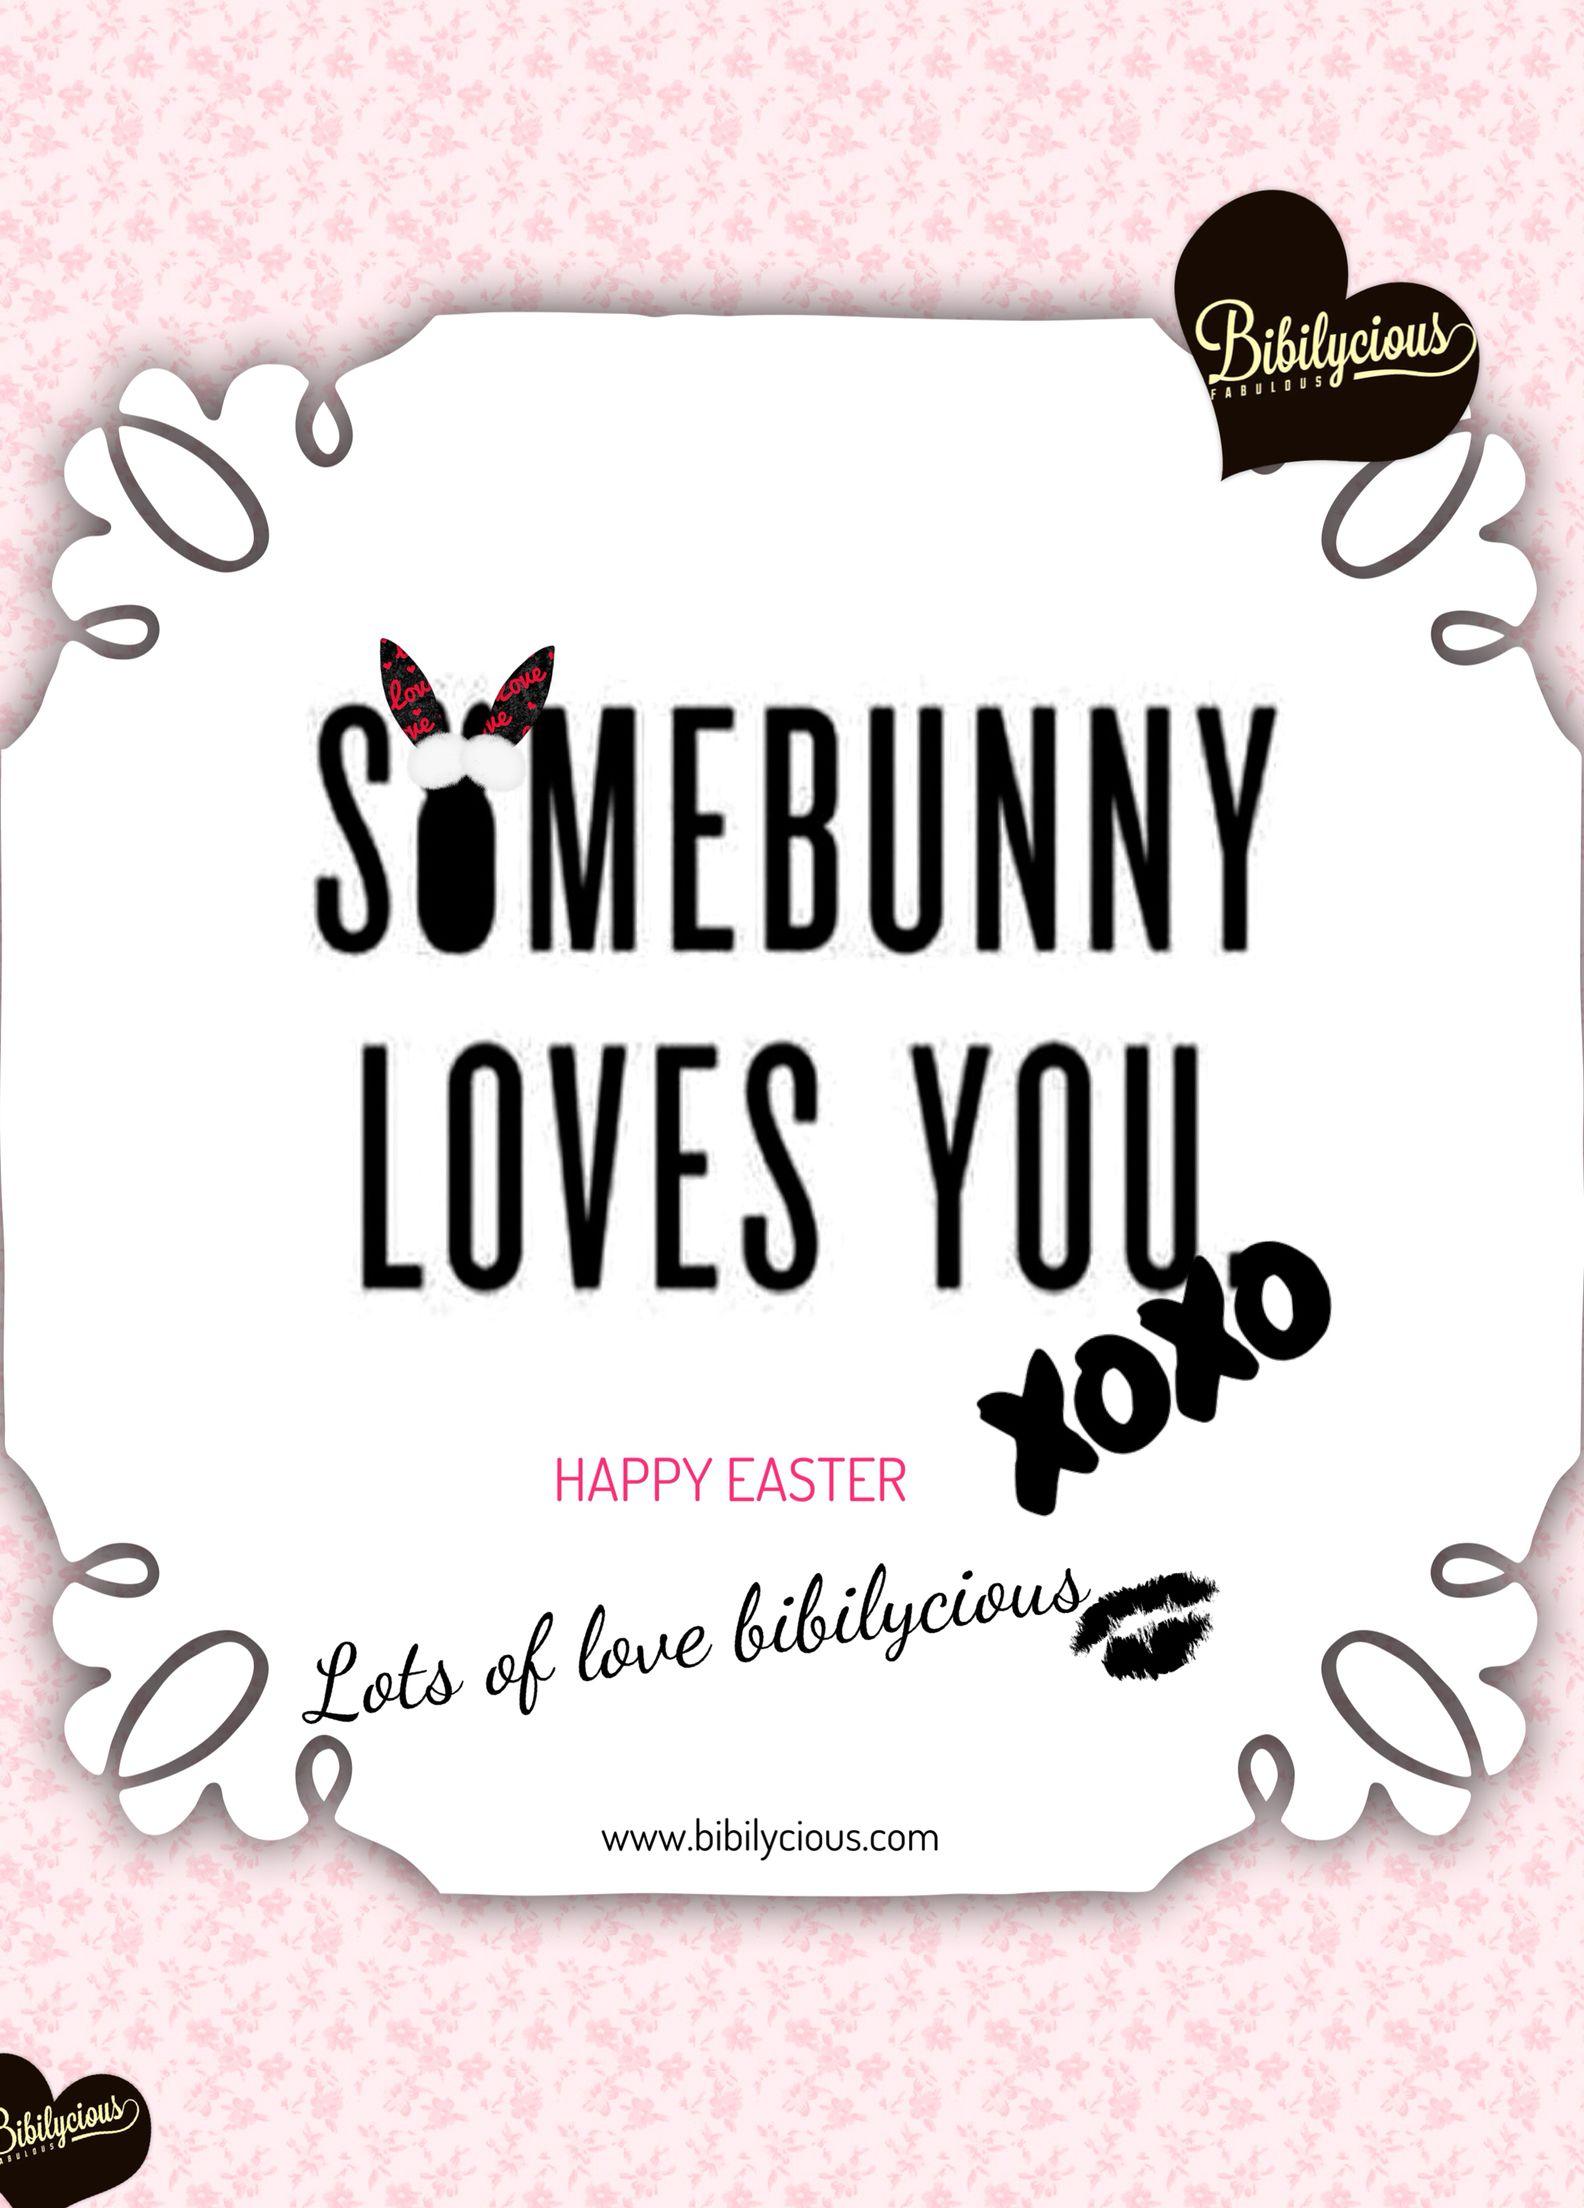 Happy Easter Every Bunny. Lots of Love Bibilycious.com